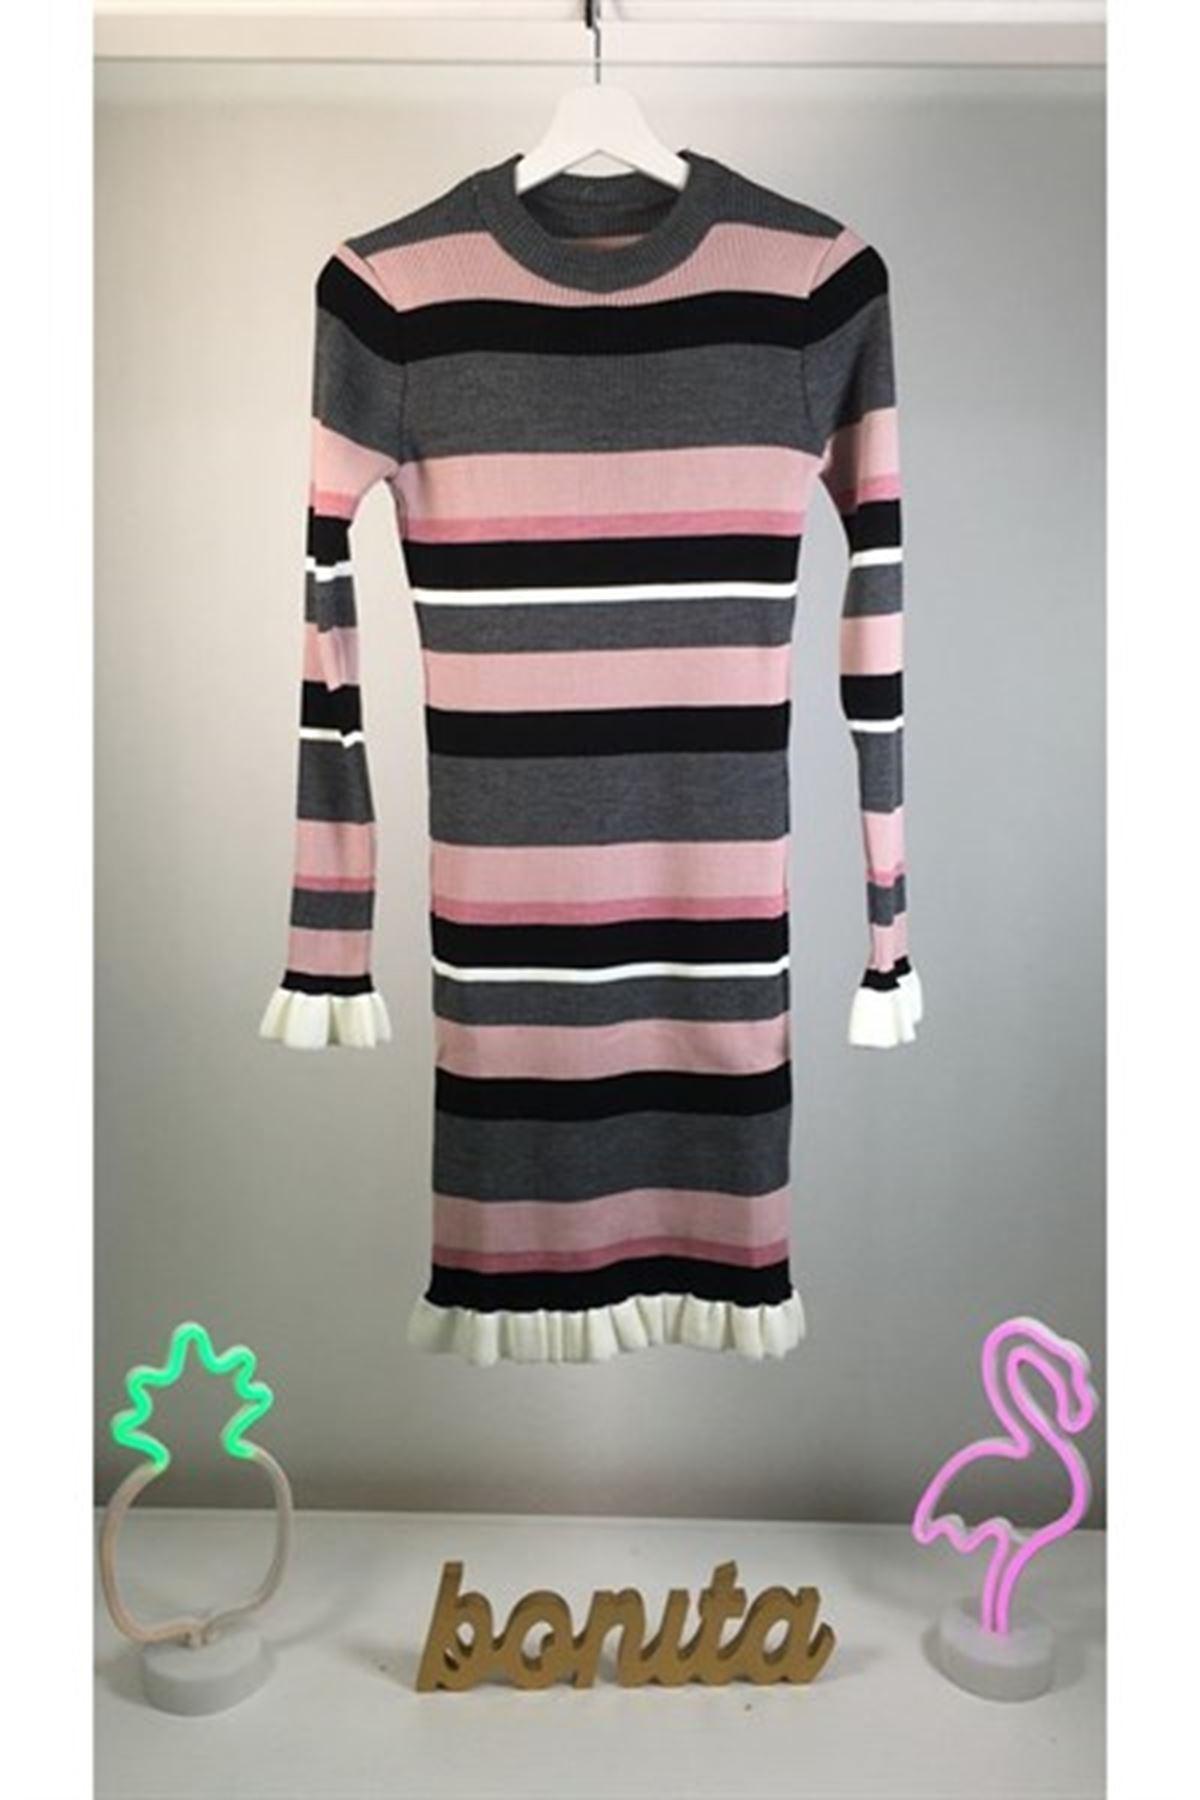 İpek Triko Renkli Elbise K74 MULTİ